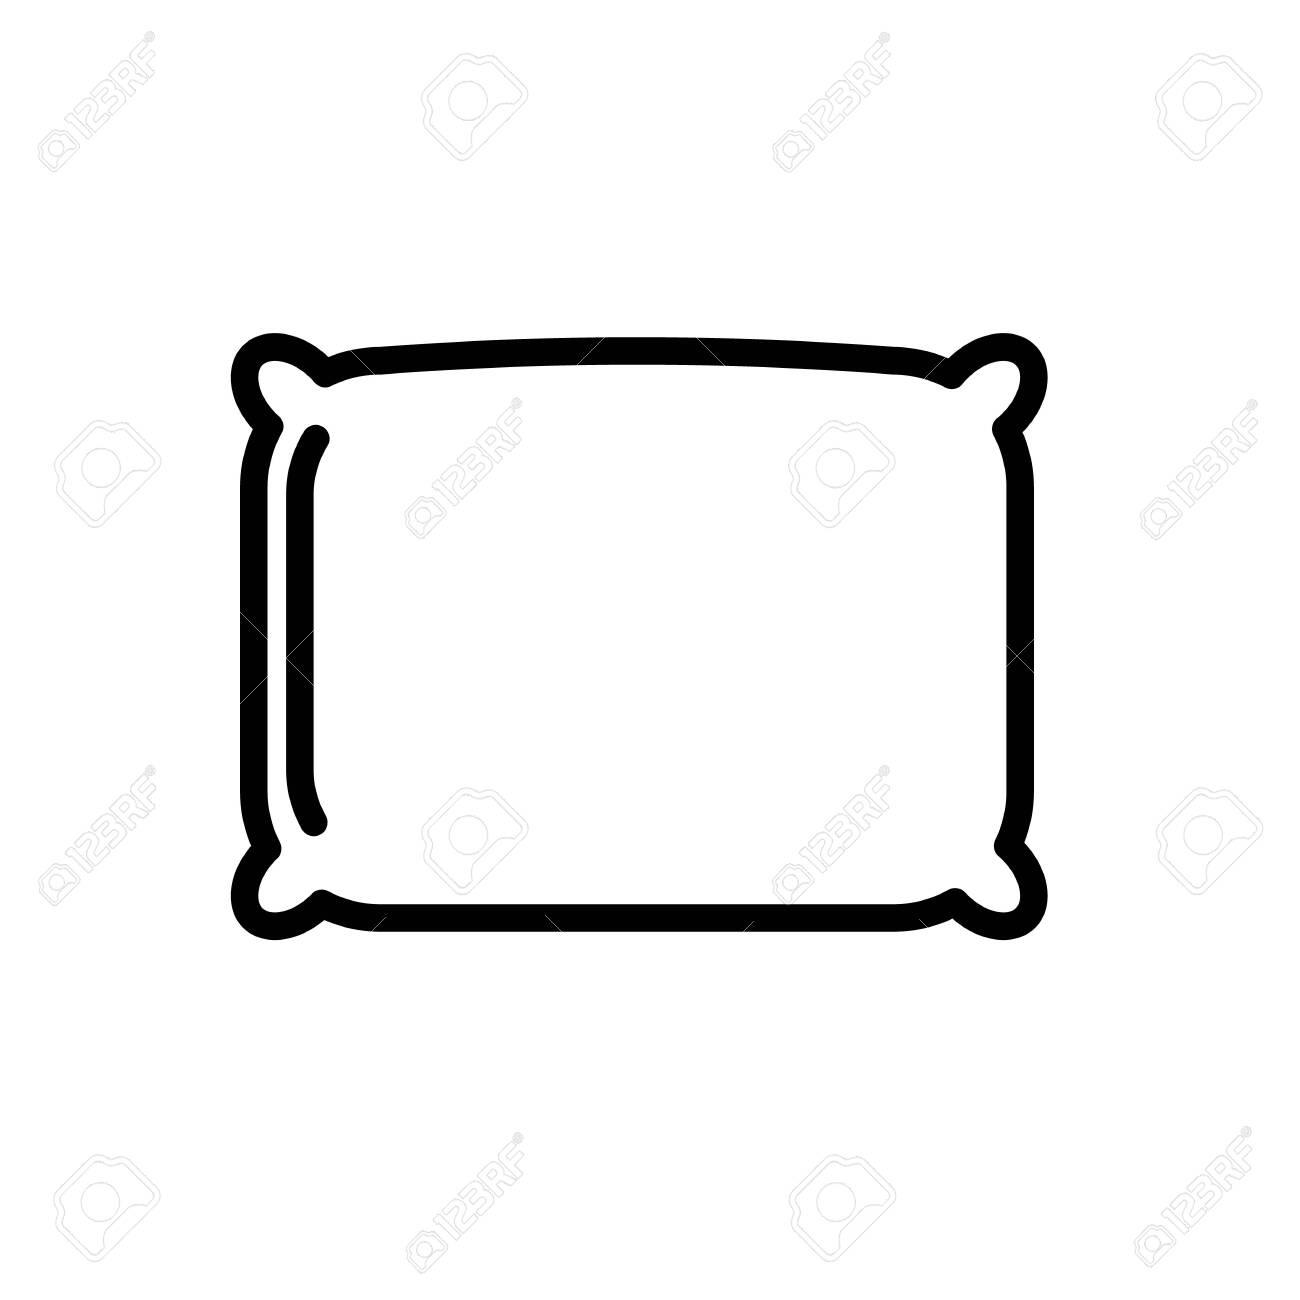 Square pillow minimal black and white outline icon. - 150936697